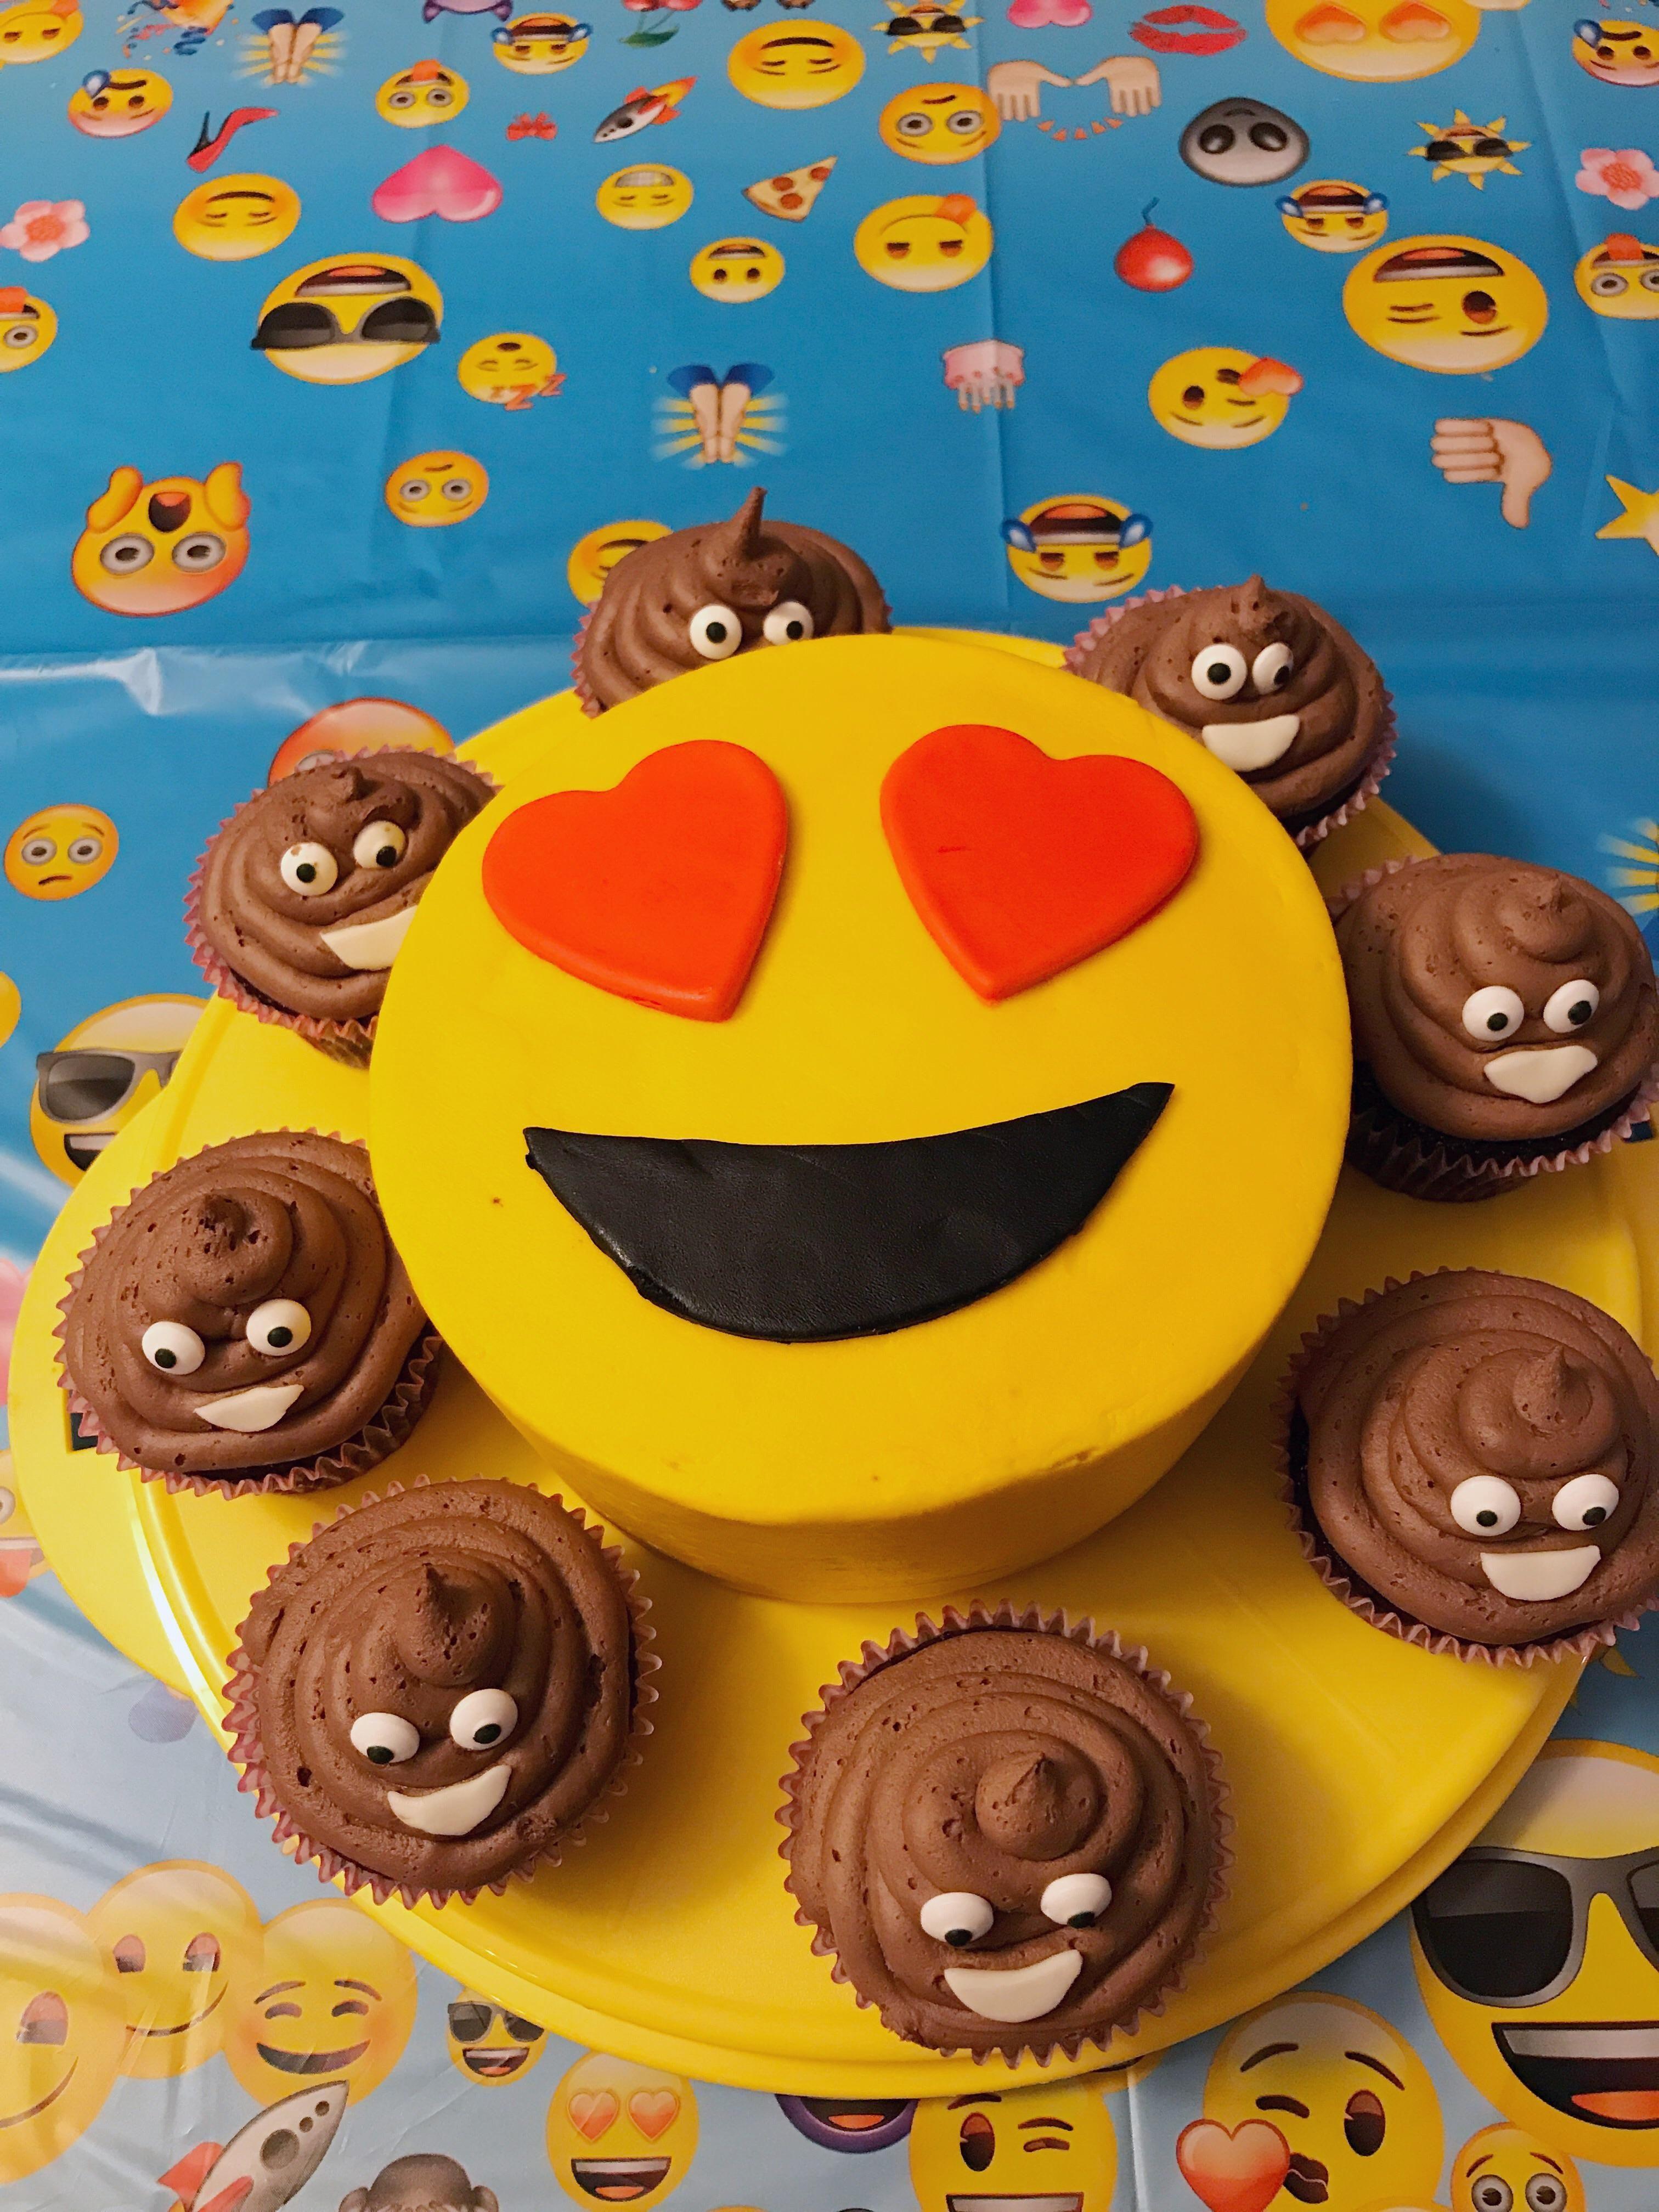 Homemade] Emoji cake with chocolate ice cream emoji cupcakes ...